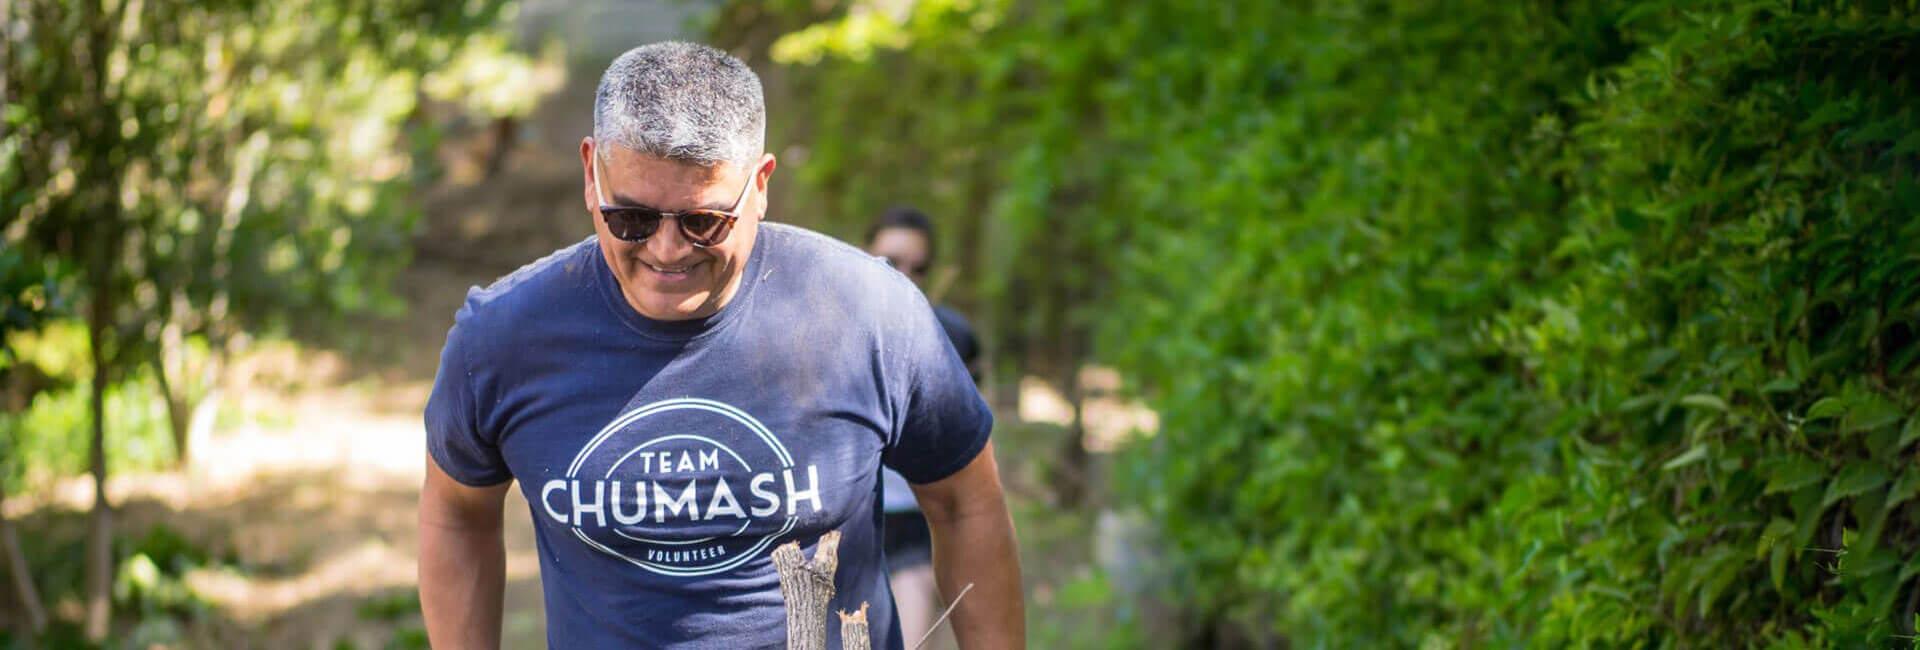 Chumash Careers - Philanthropy